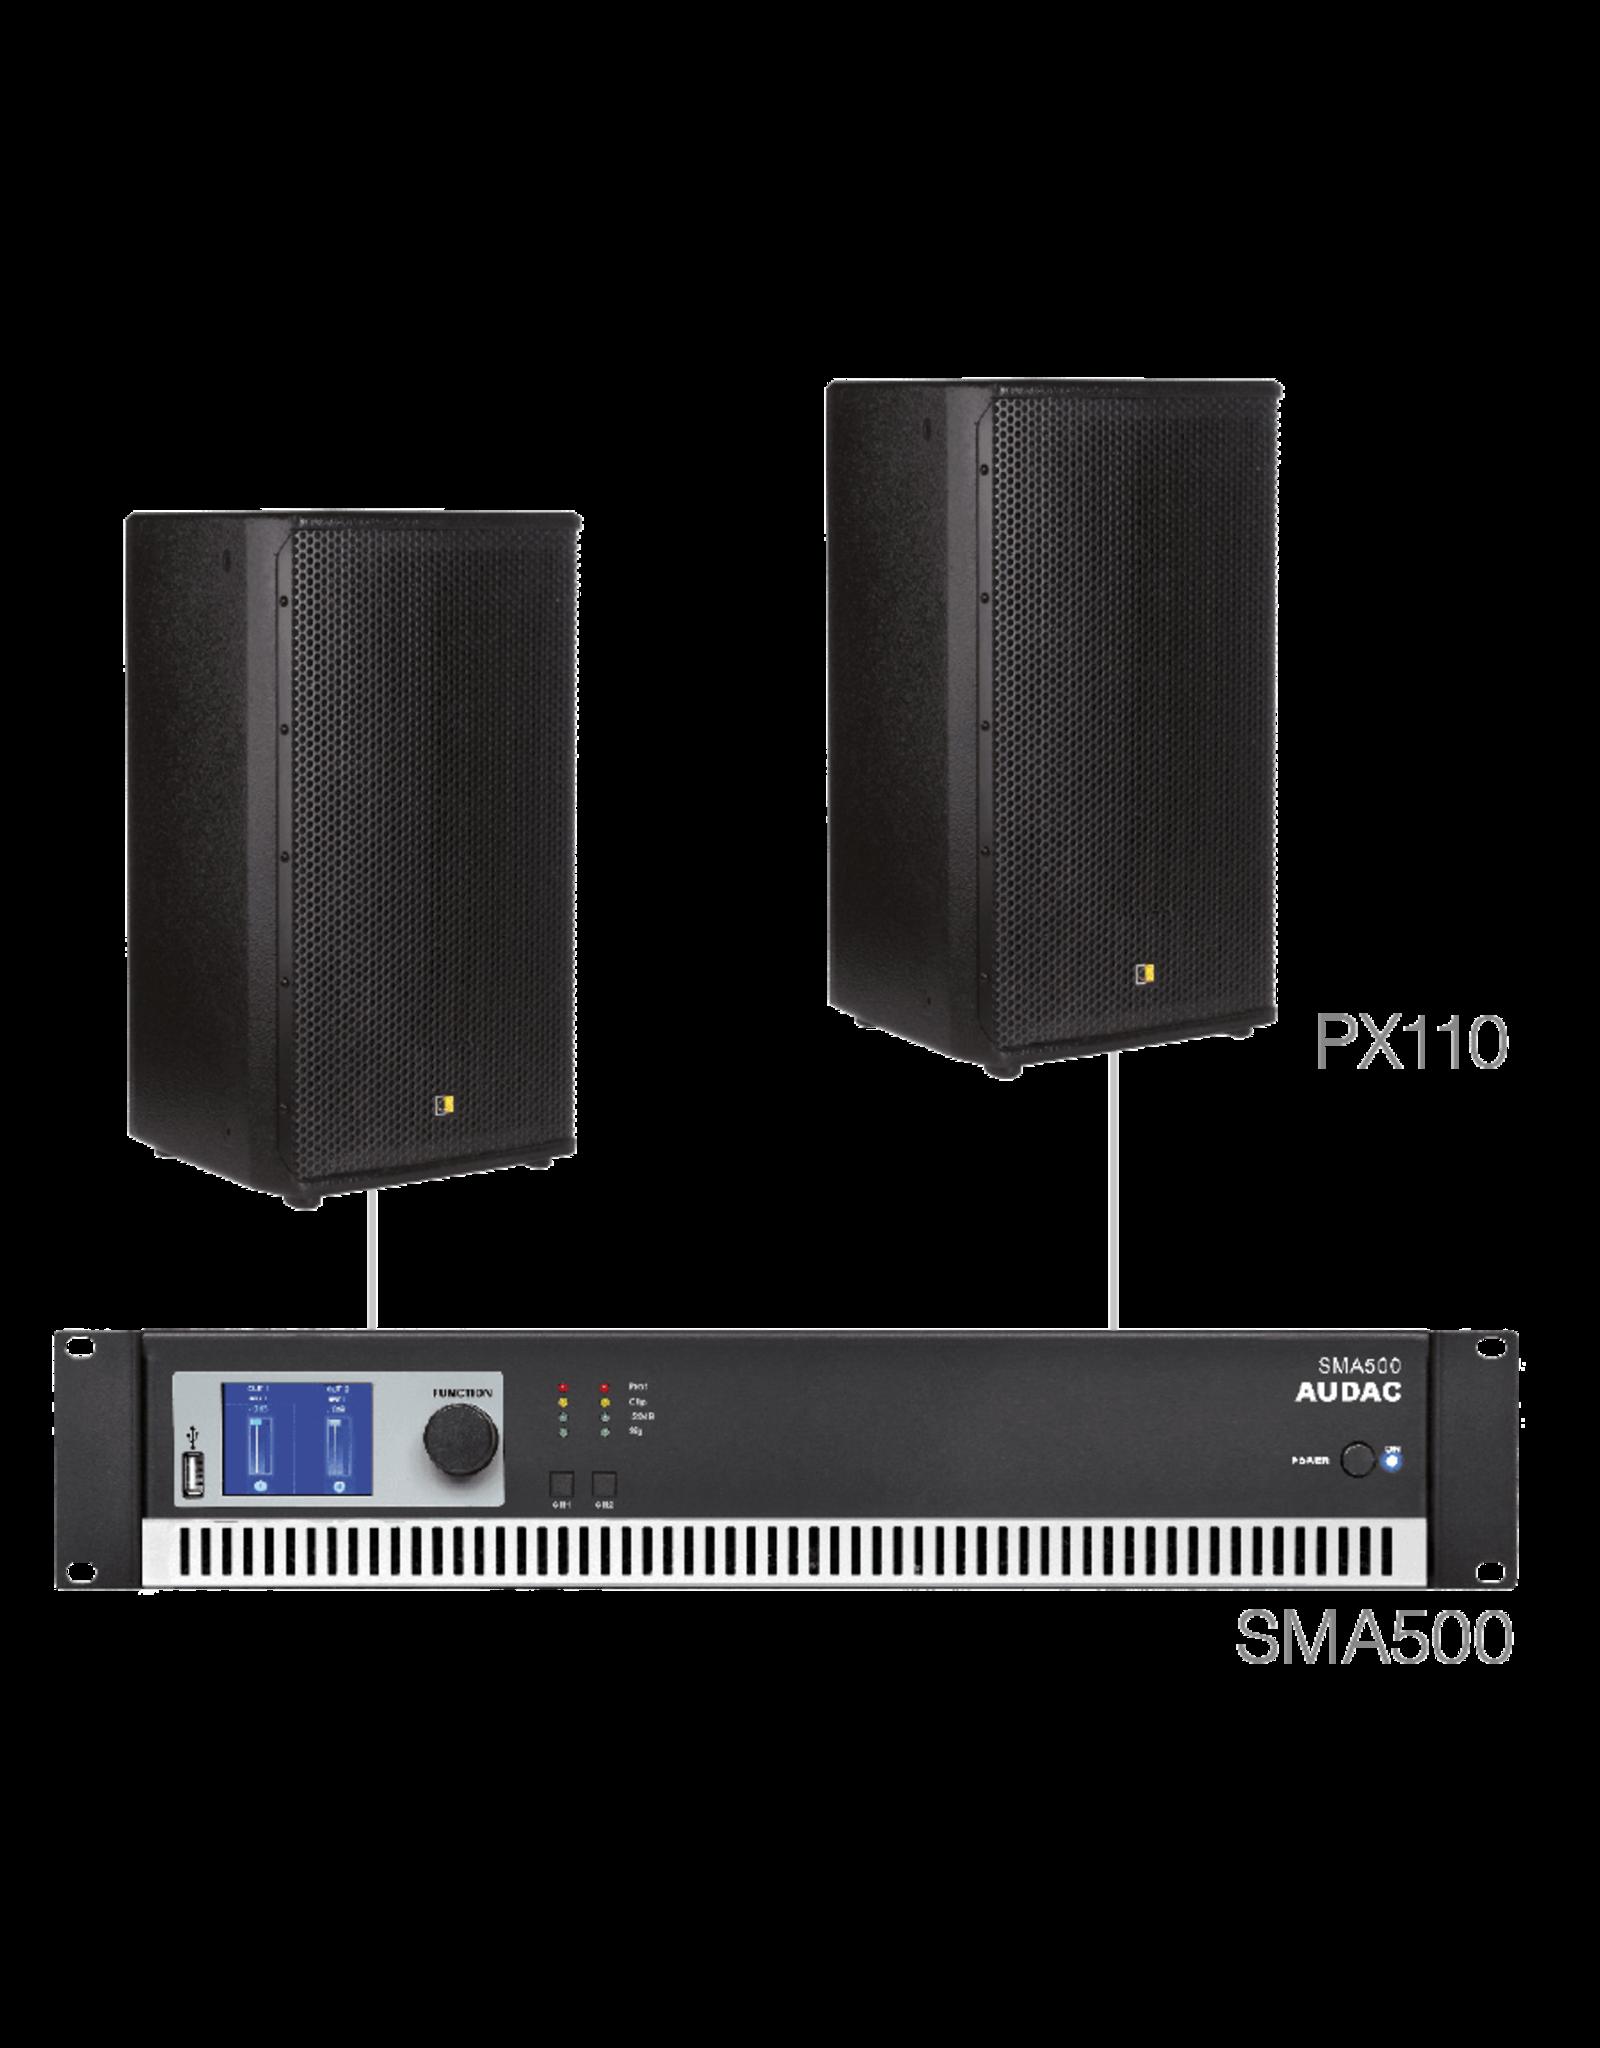 Audac 2 x PX110 + SMA500 Black version